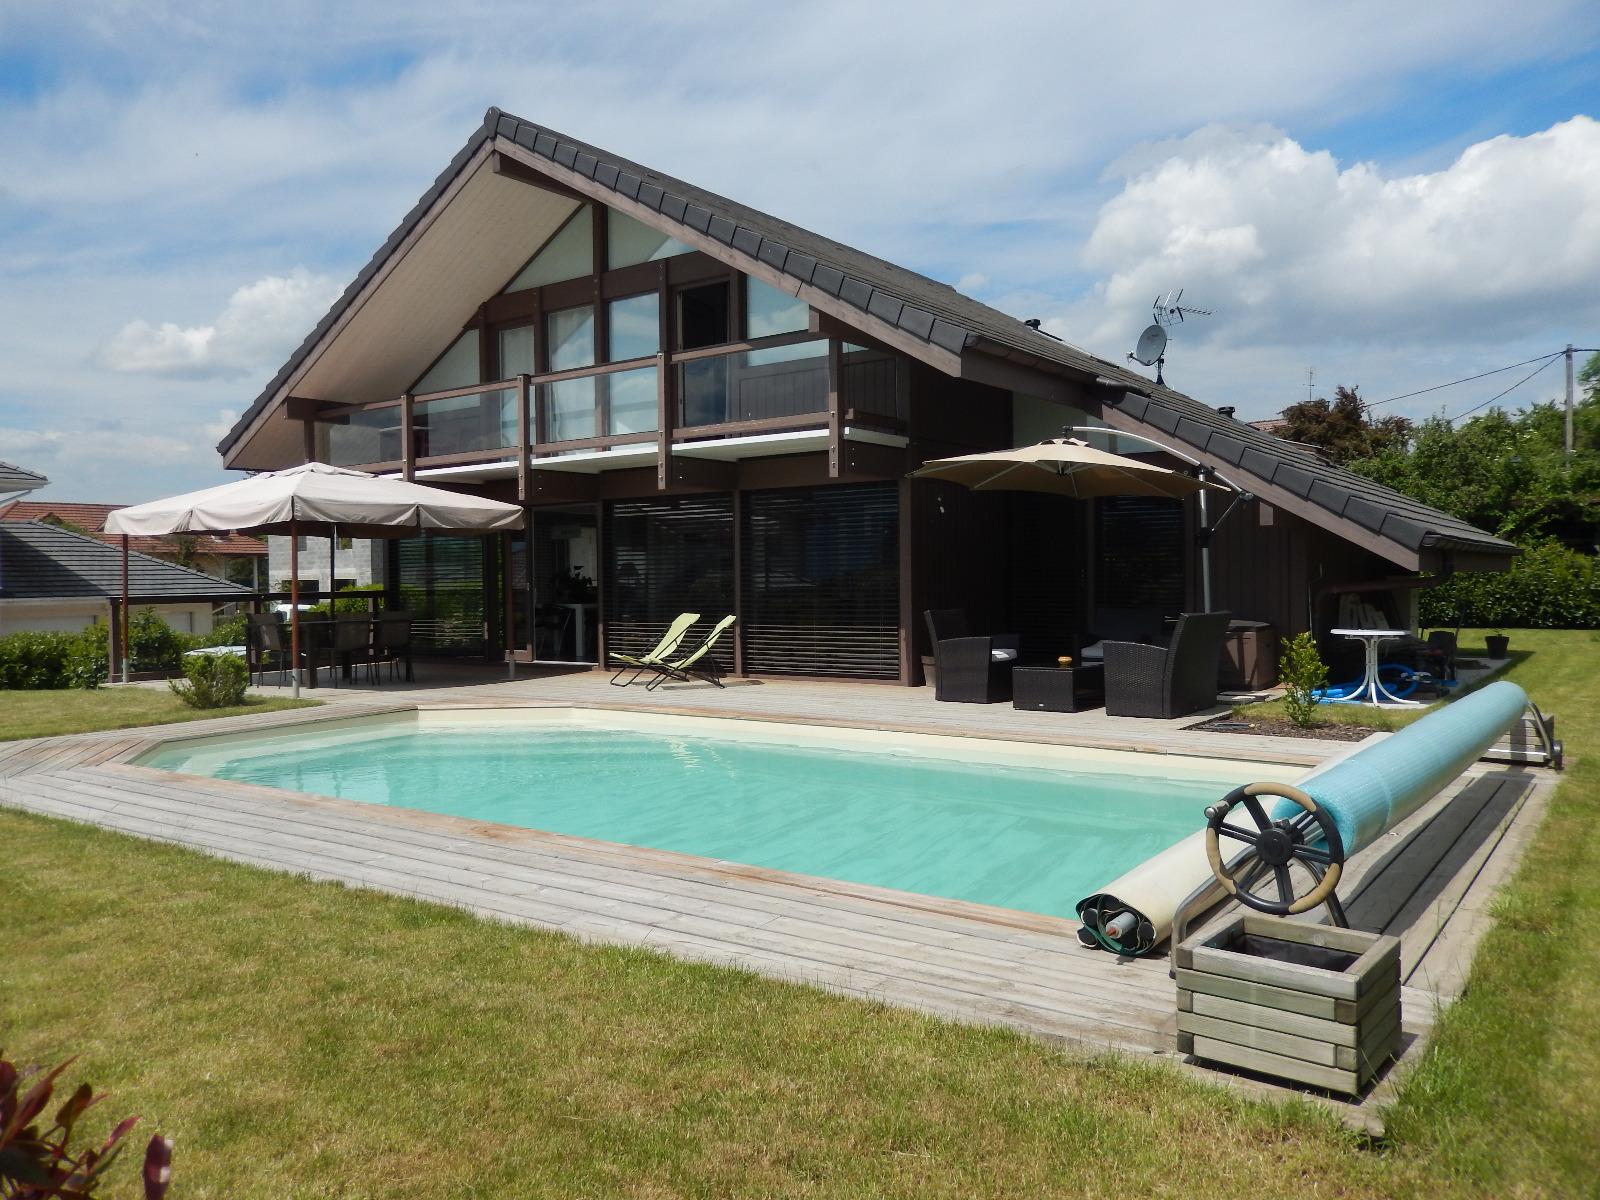 Maison a vendre moderne avec piscine for Idee interieur maison design moderne